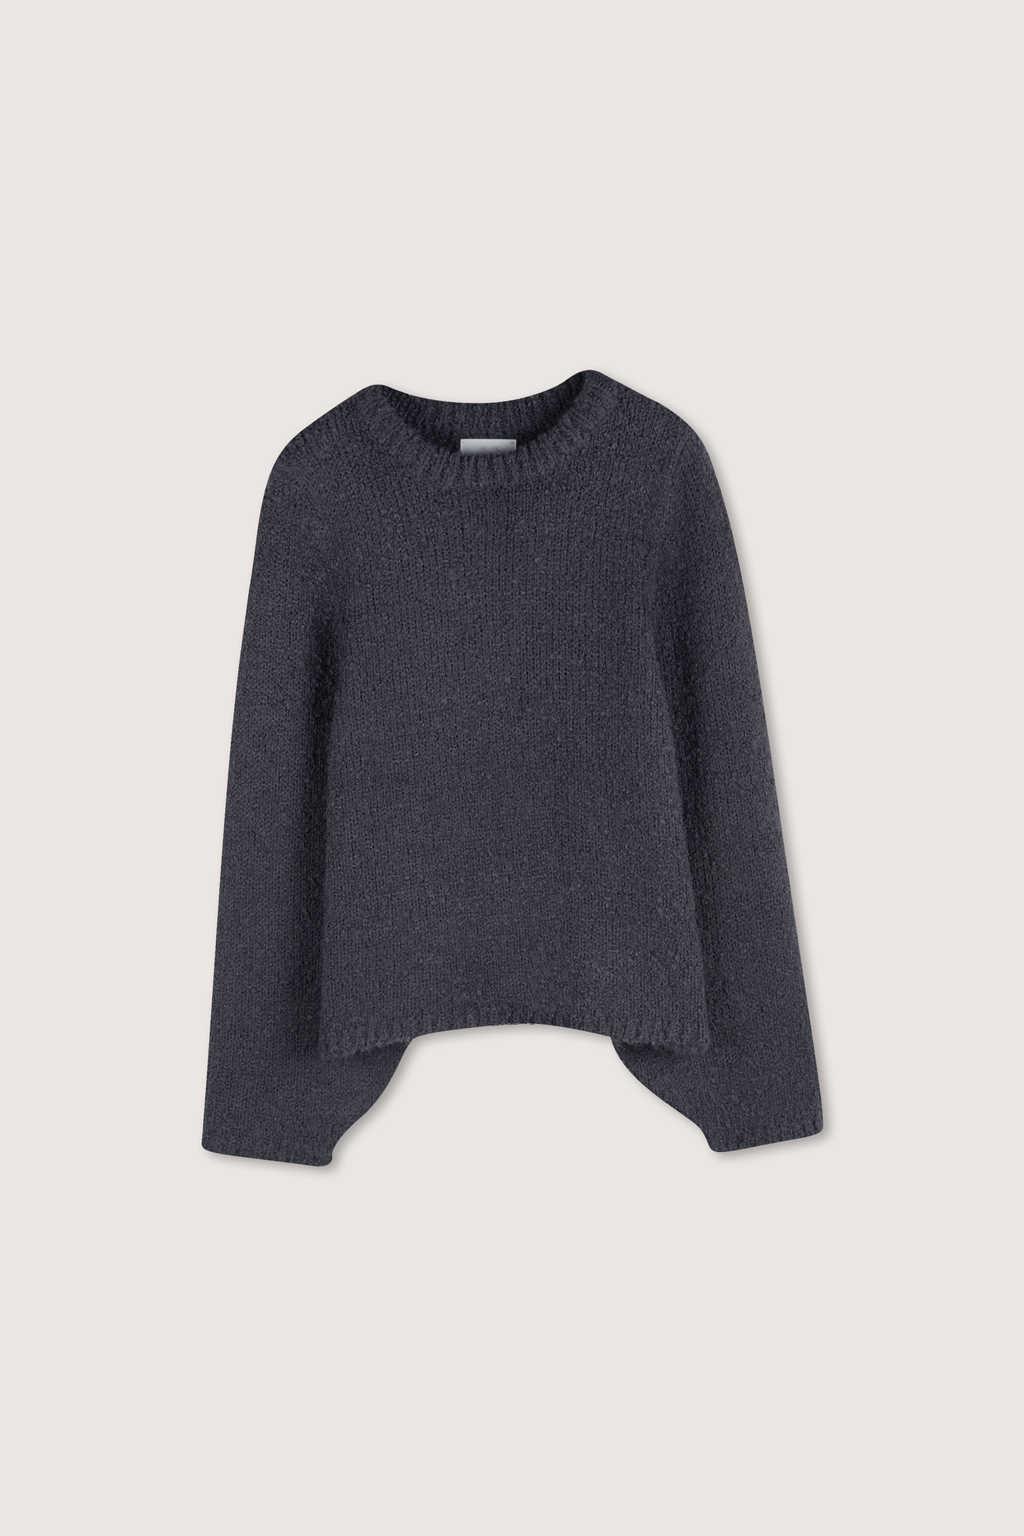 Sweater 1953 Navy 11